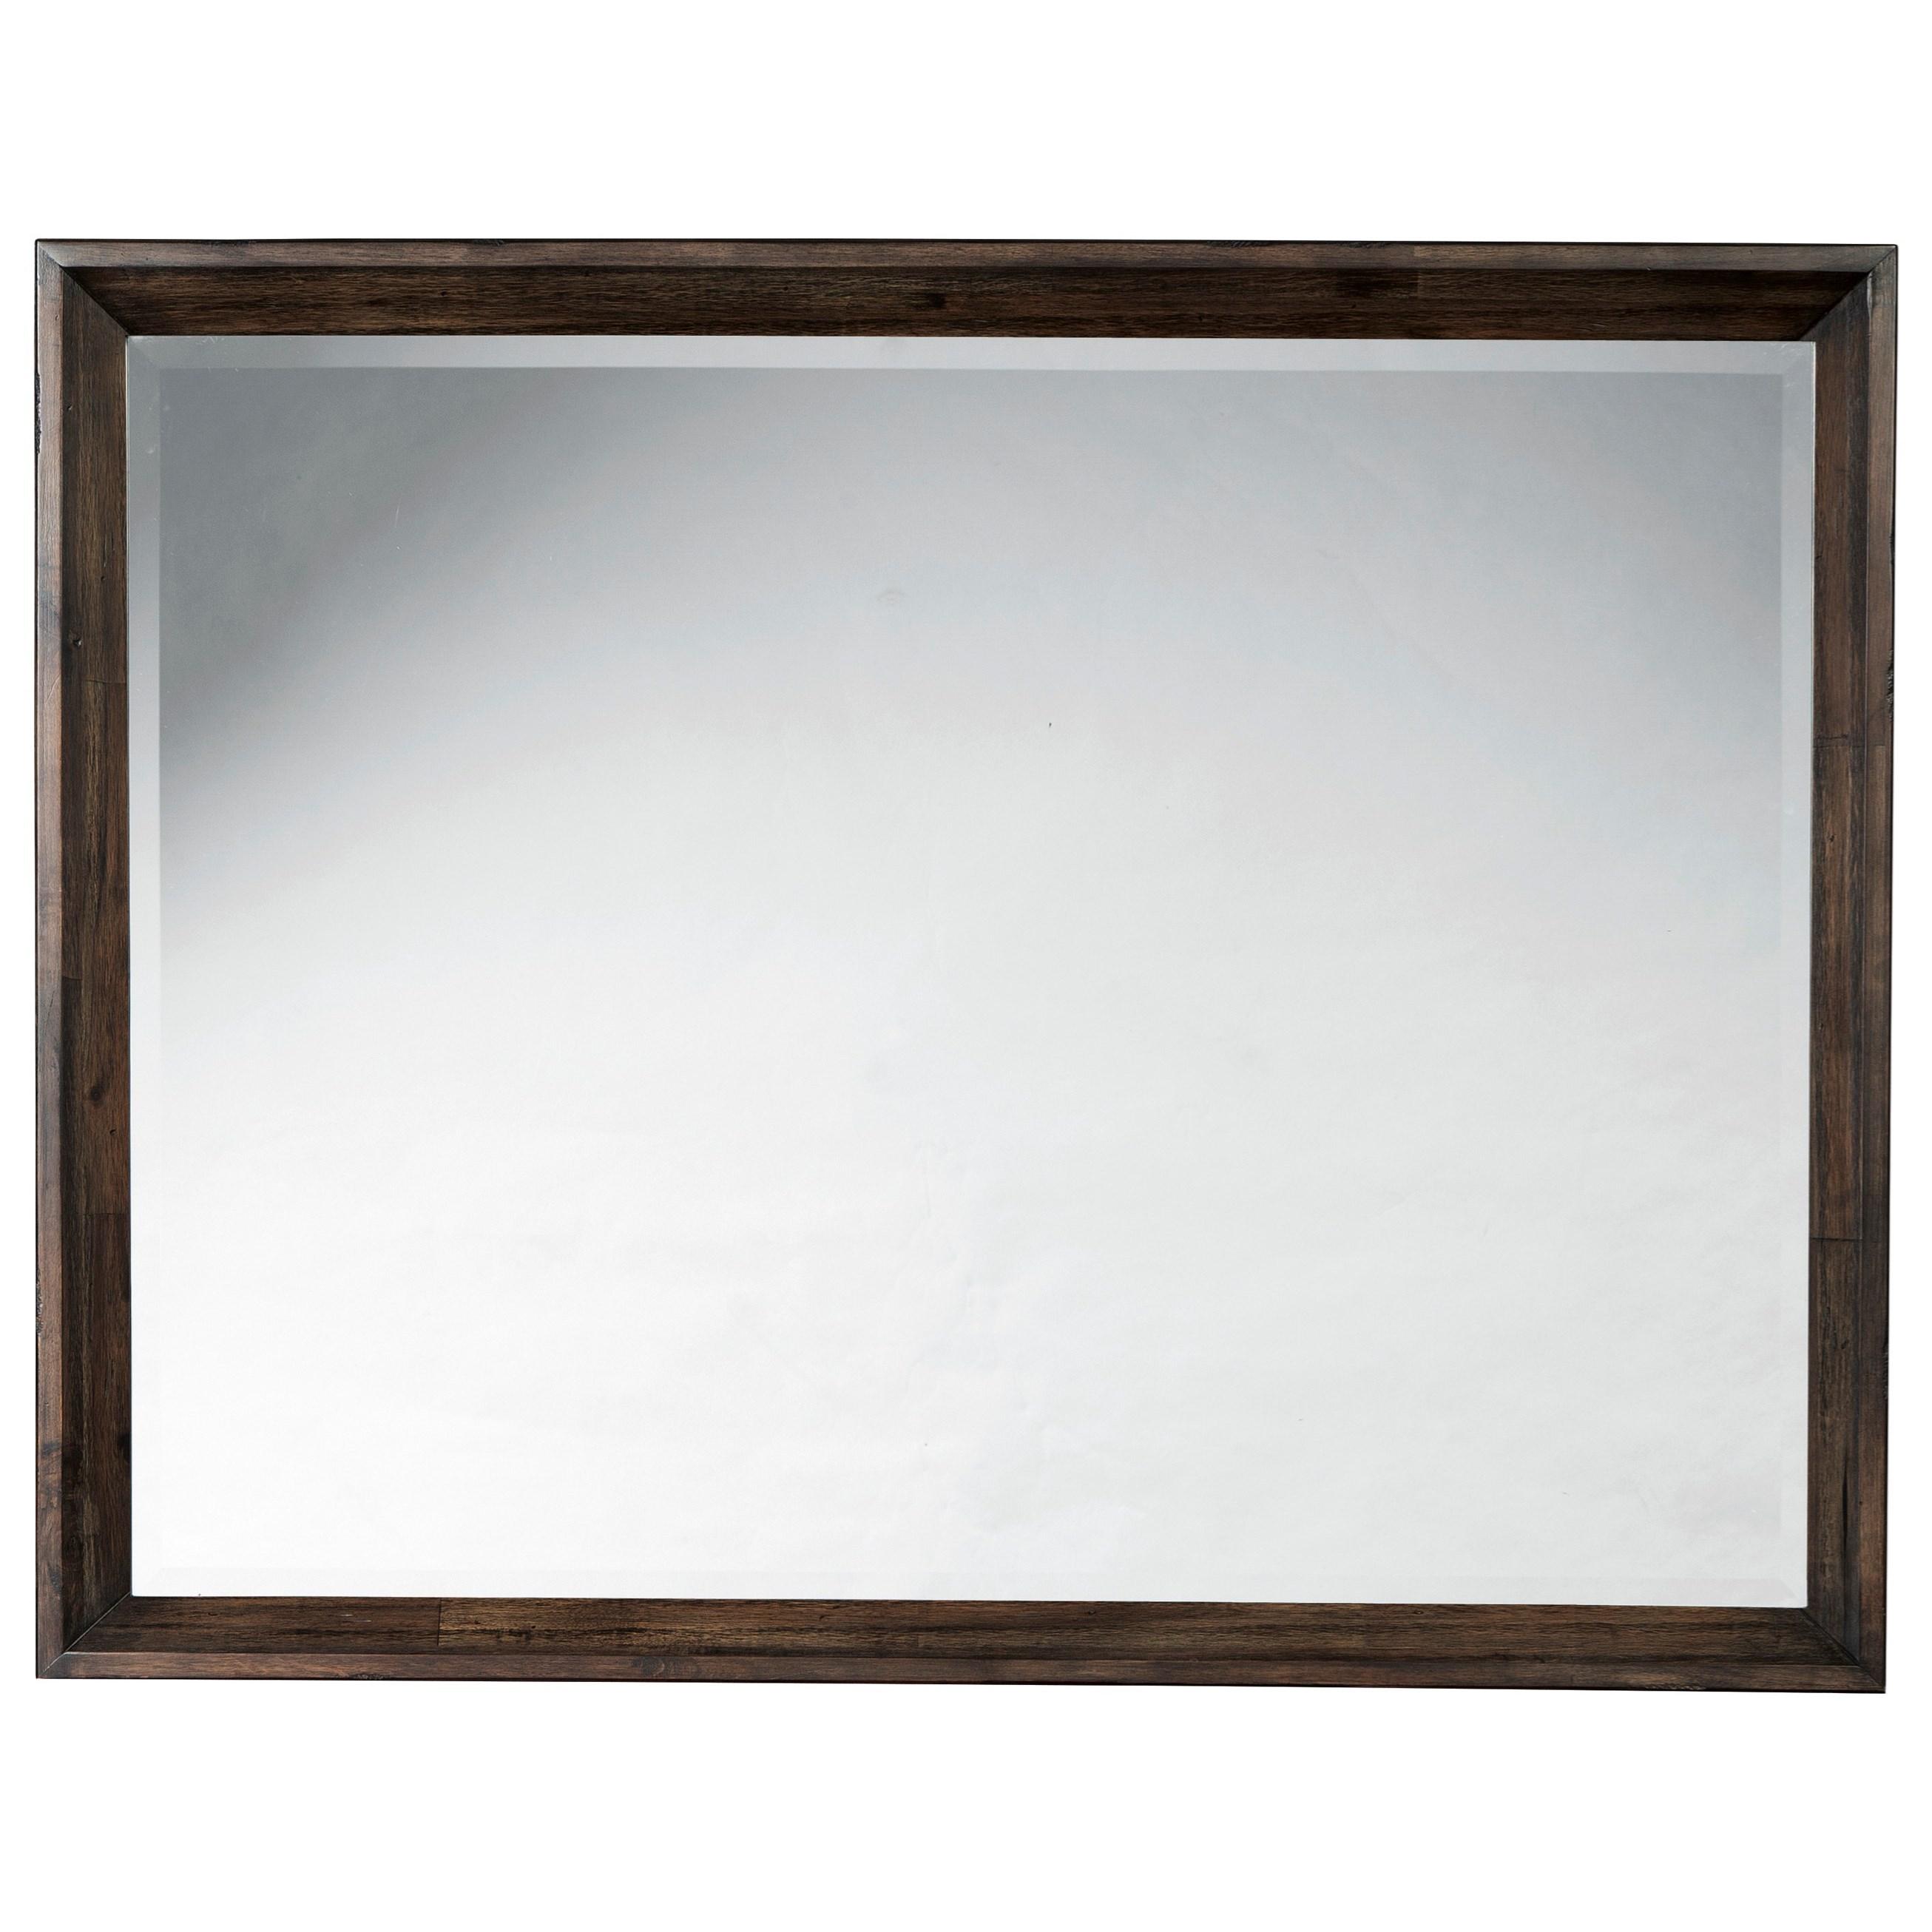 Johurst Bedroom Mirror by Signature at Walker's Furniture